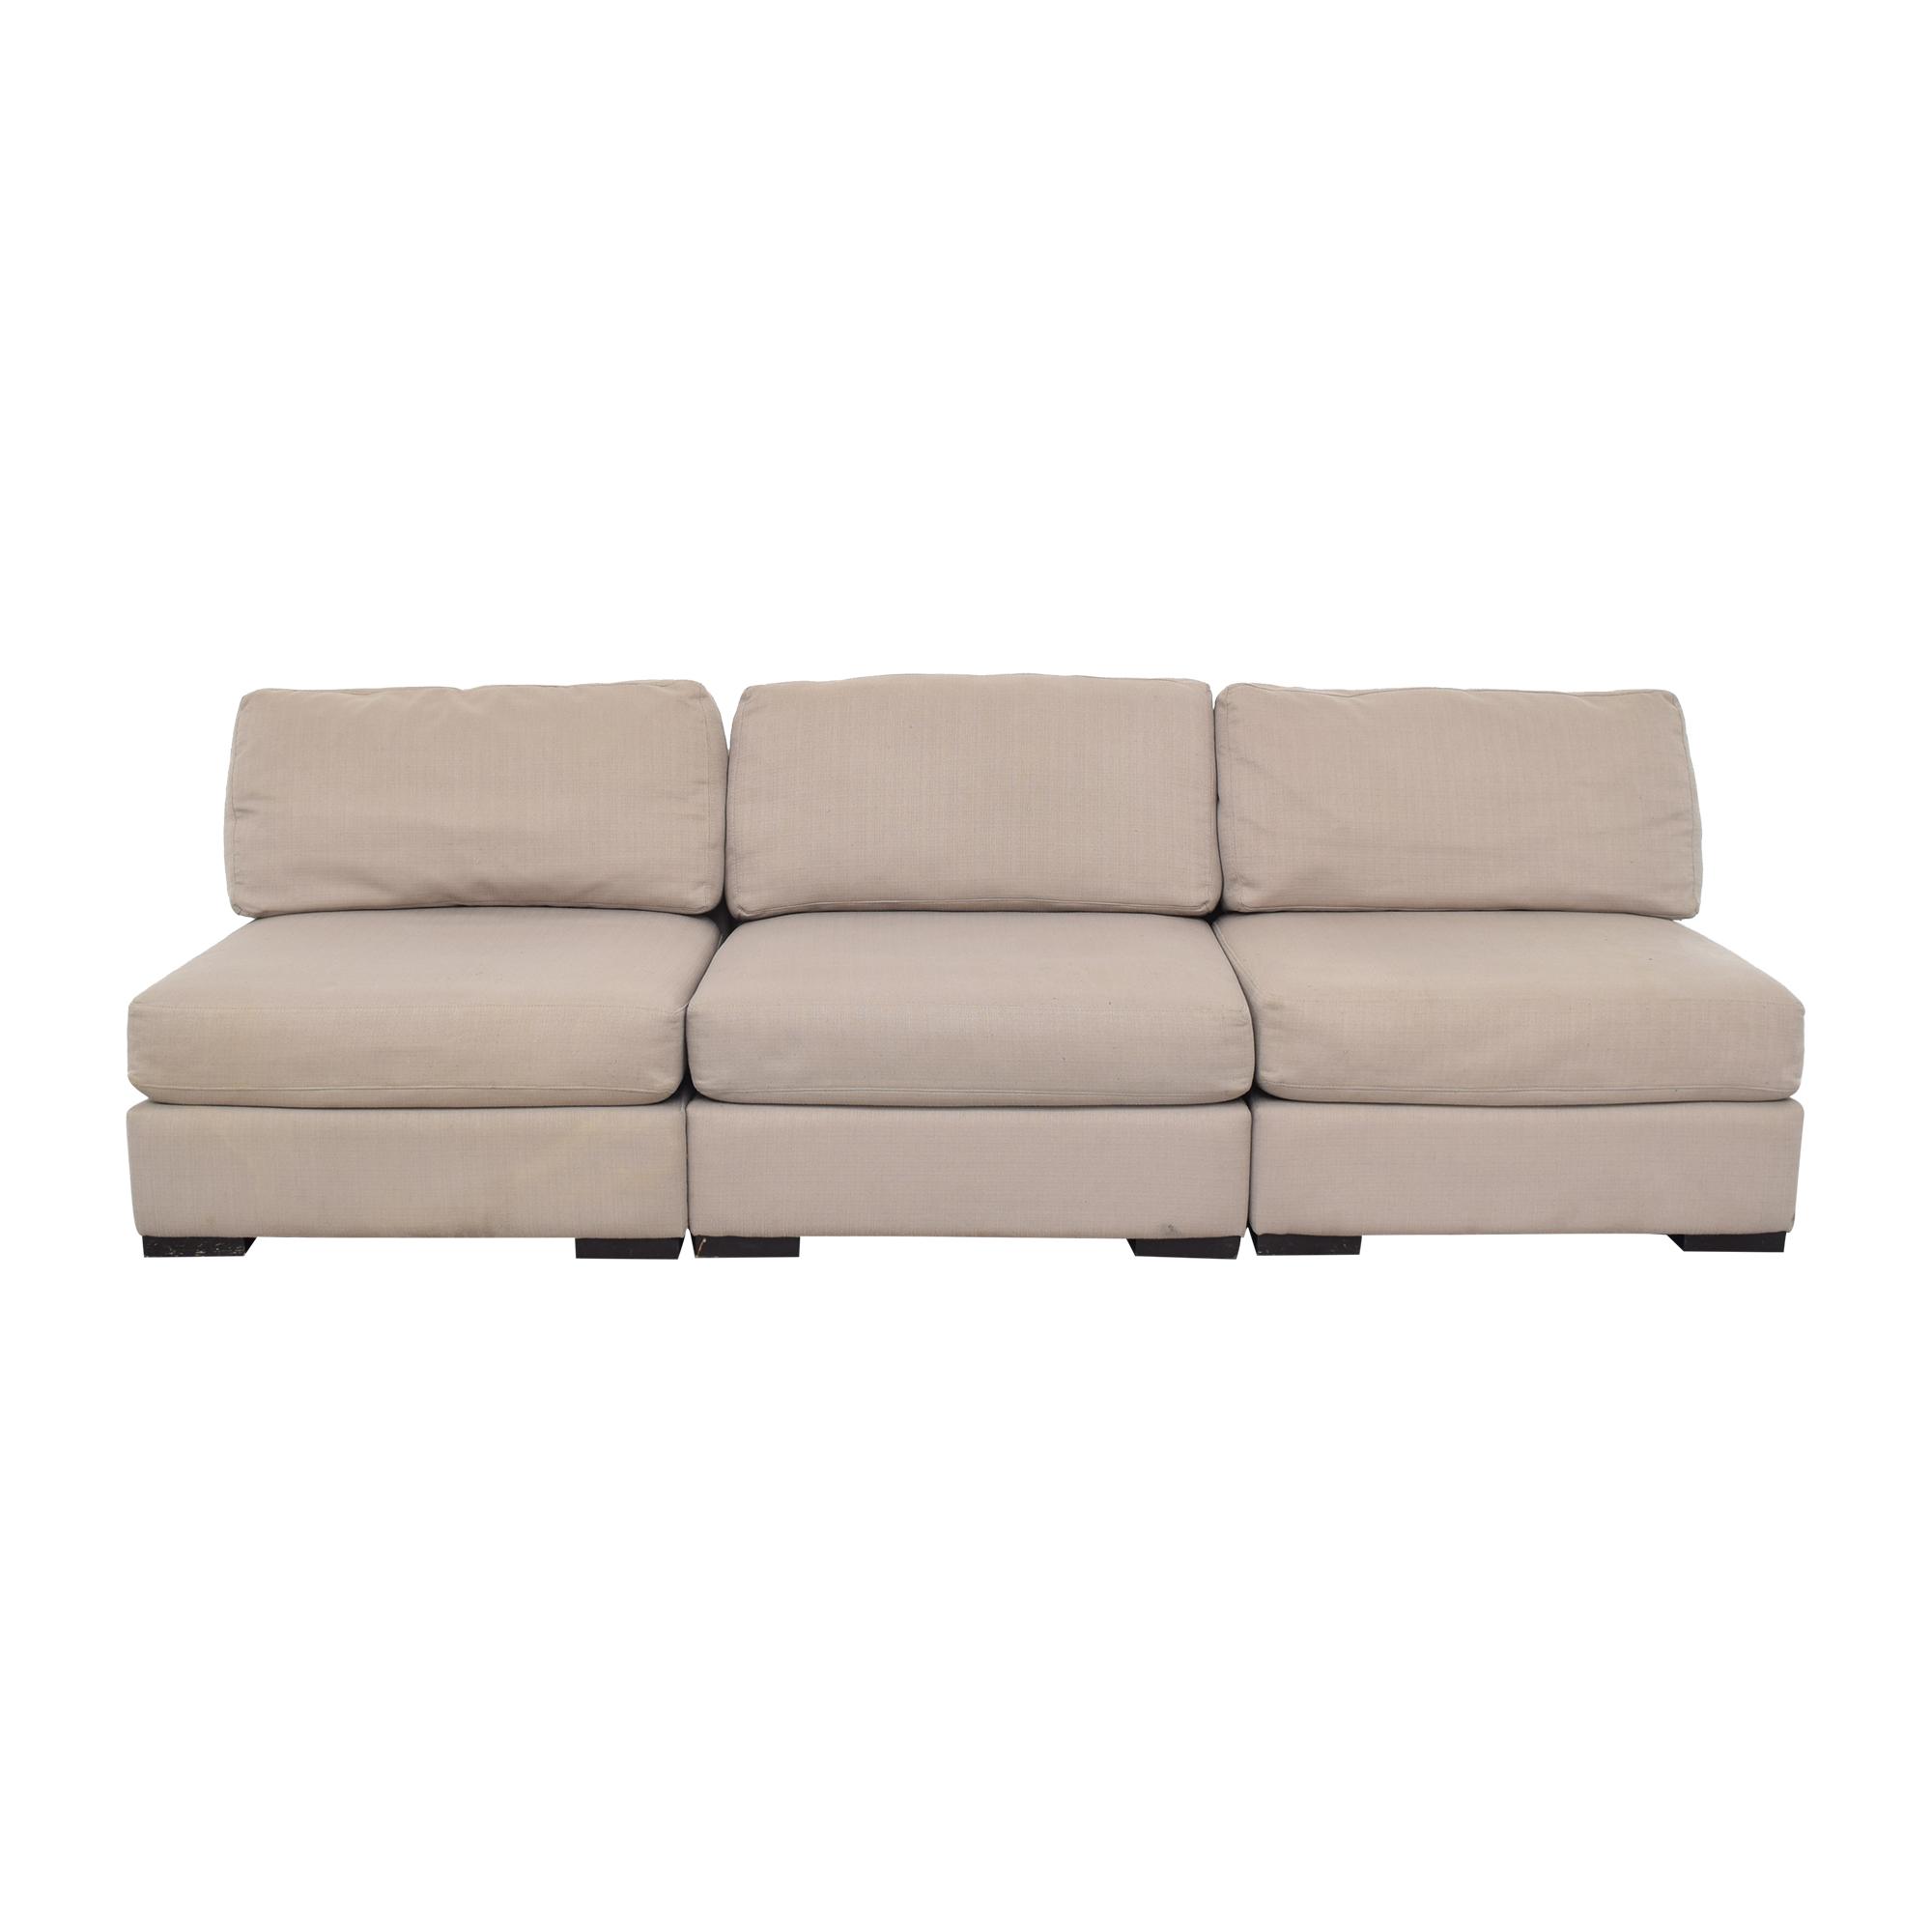 Jonathan Louis Jonathan Louis Sectional Sofa used